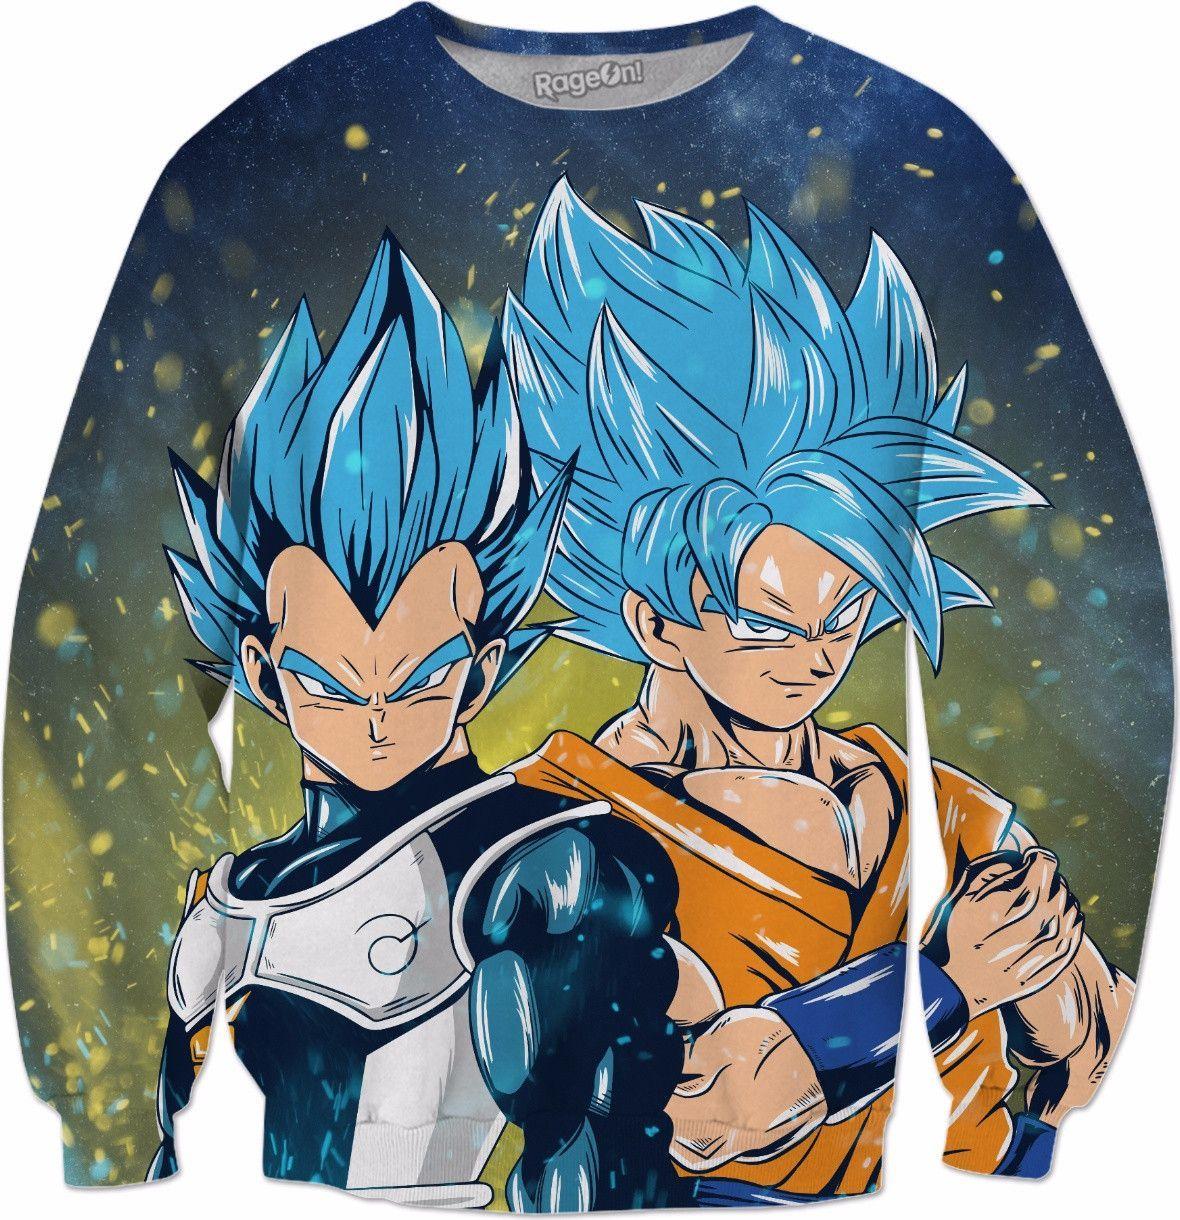 de30140e Super Saiyan - Goku & Vegeta SSj Blue Smile - All Over Print Sweatshirt -  RO01173AS